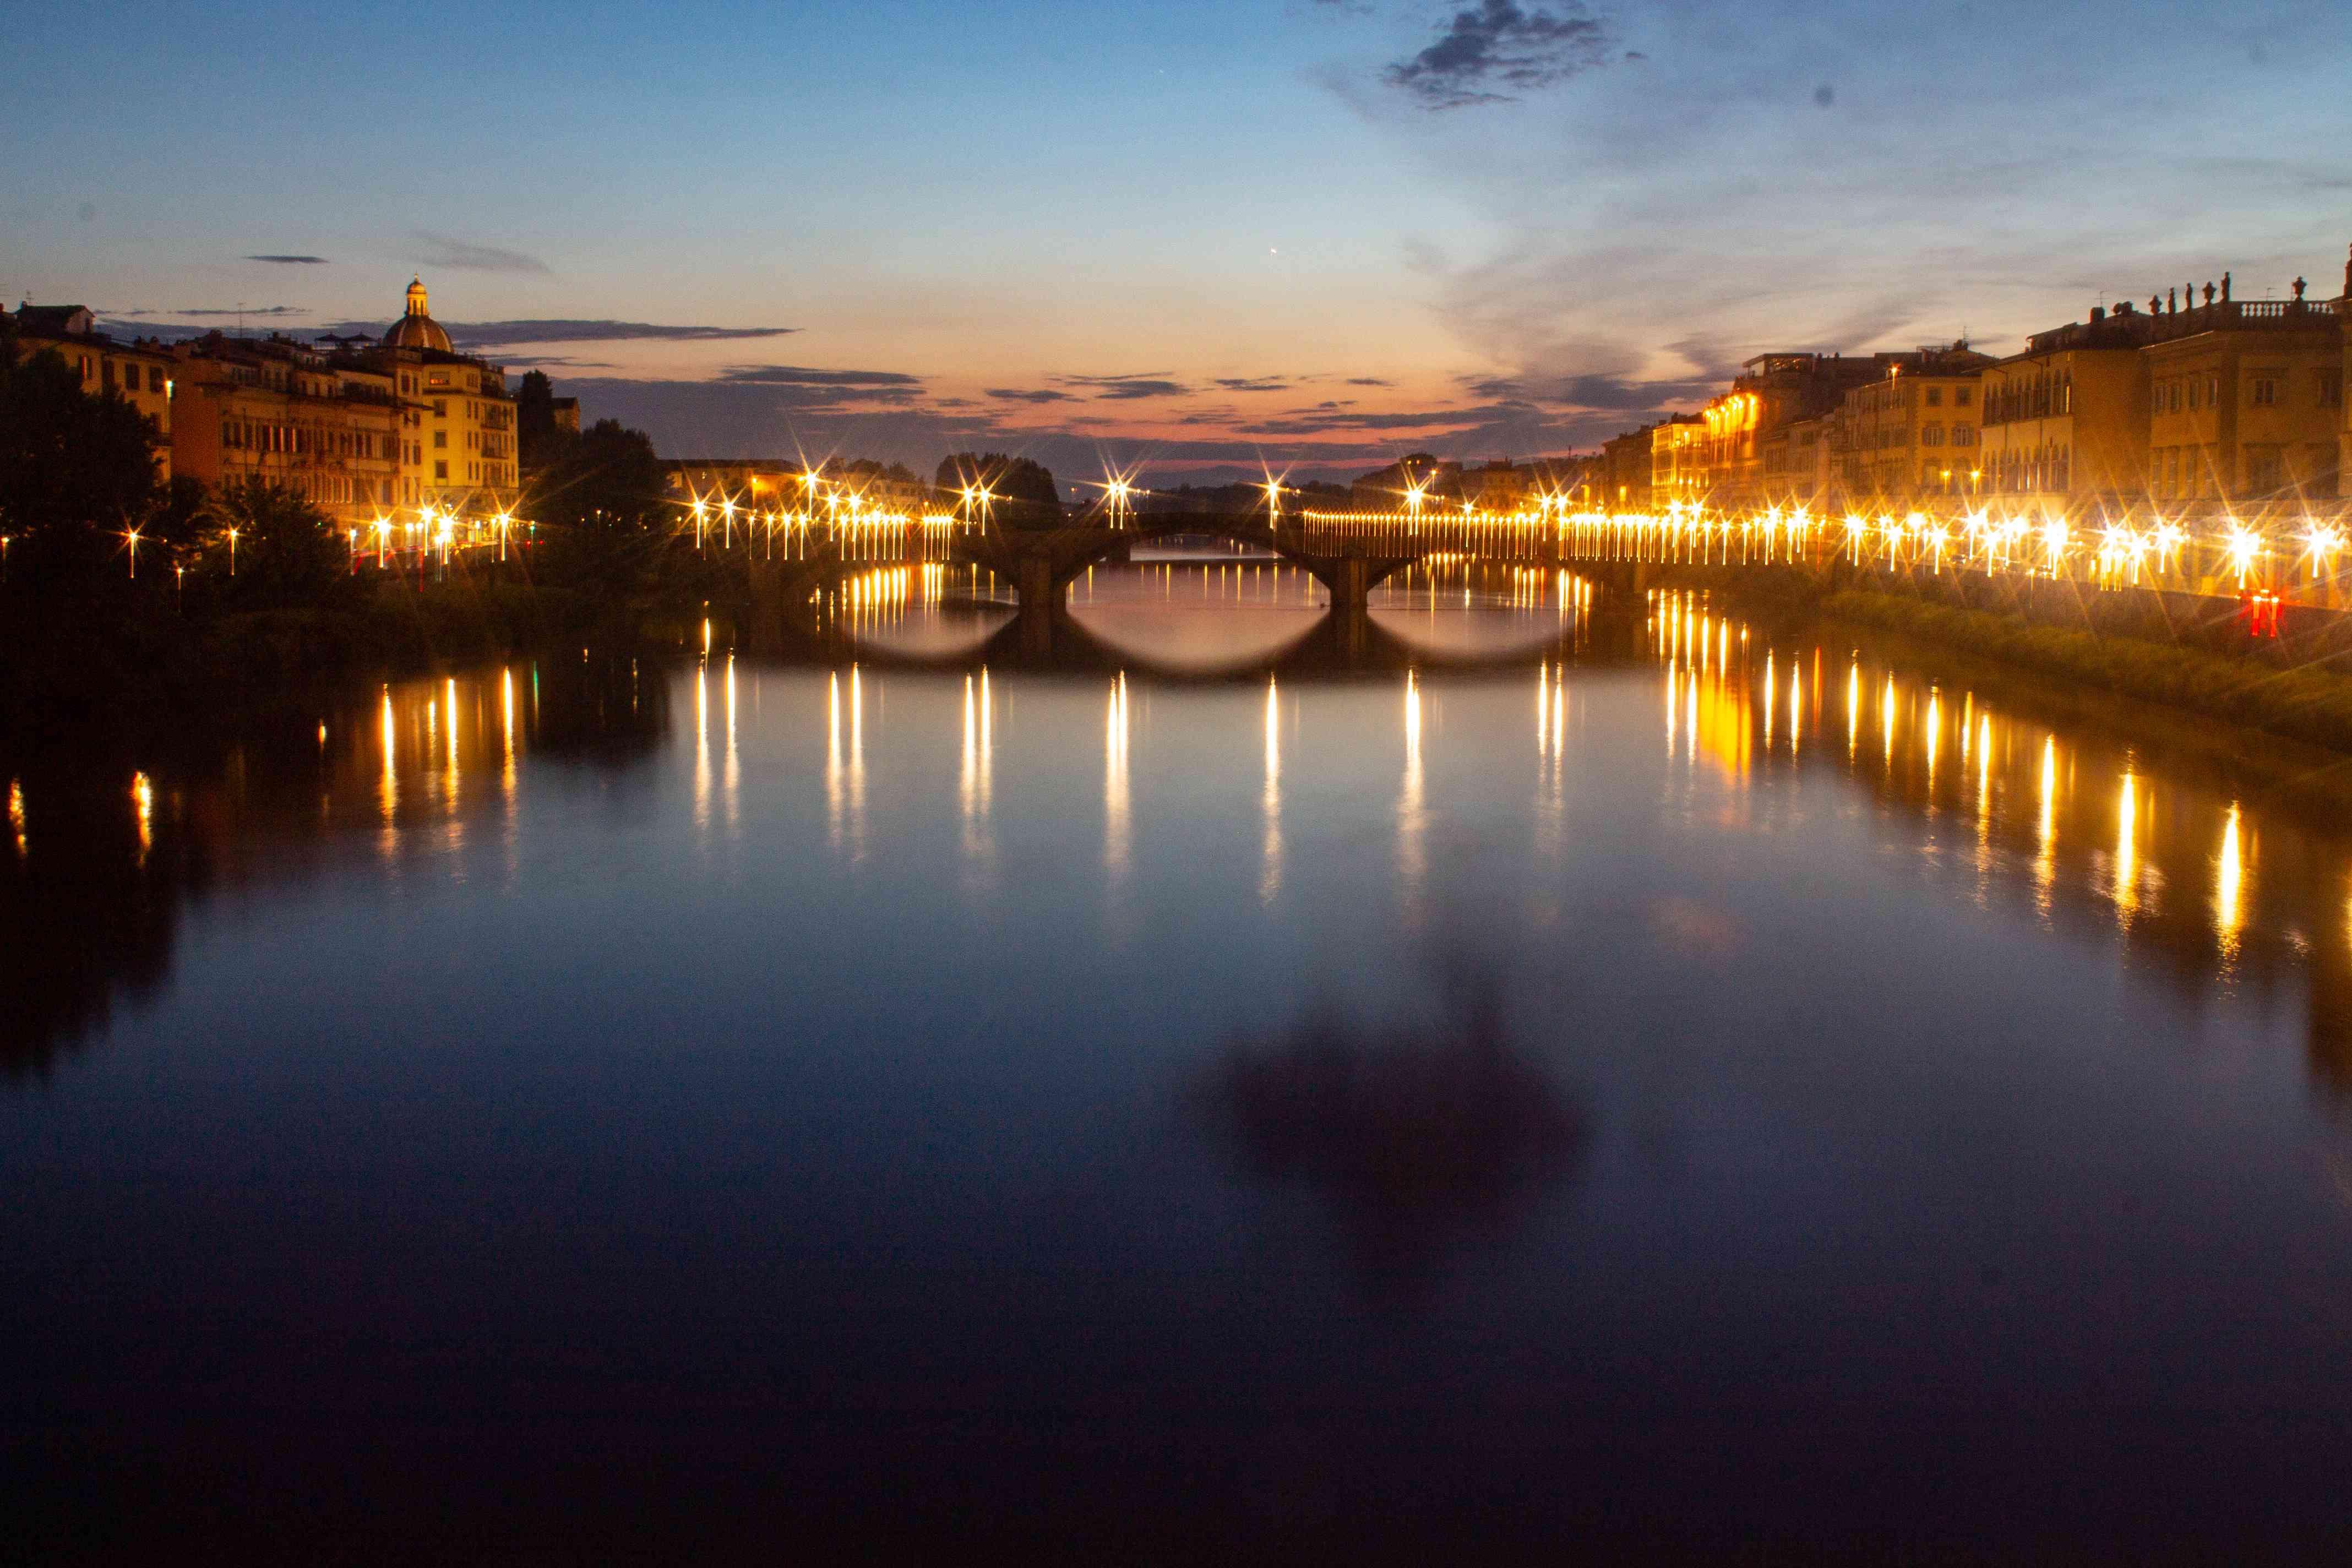 San Niccolo neighborhood in Florence